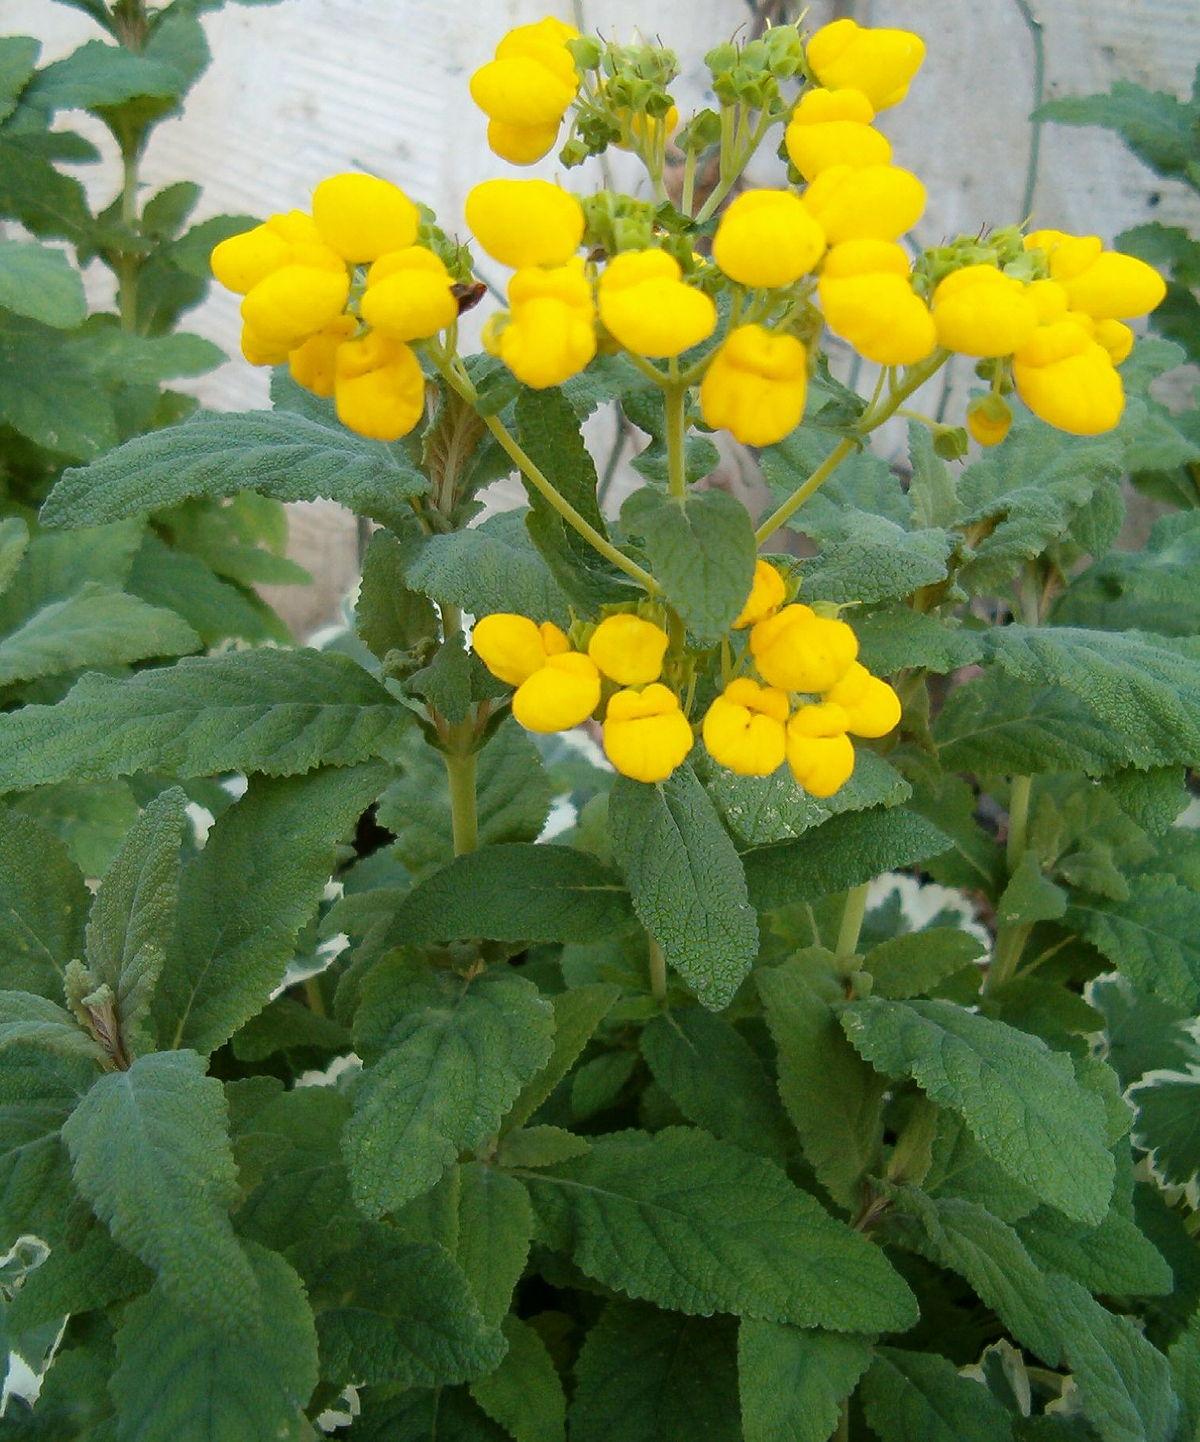 Bush Yellow Flowers In Spring